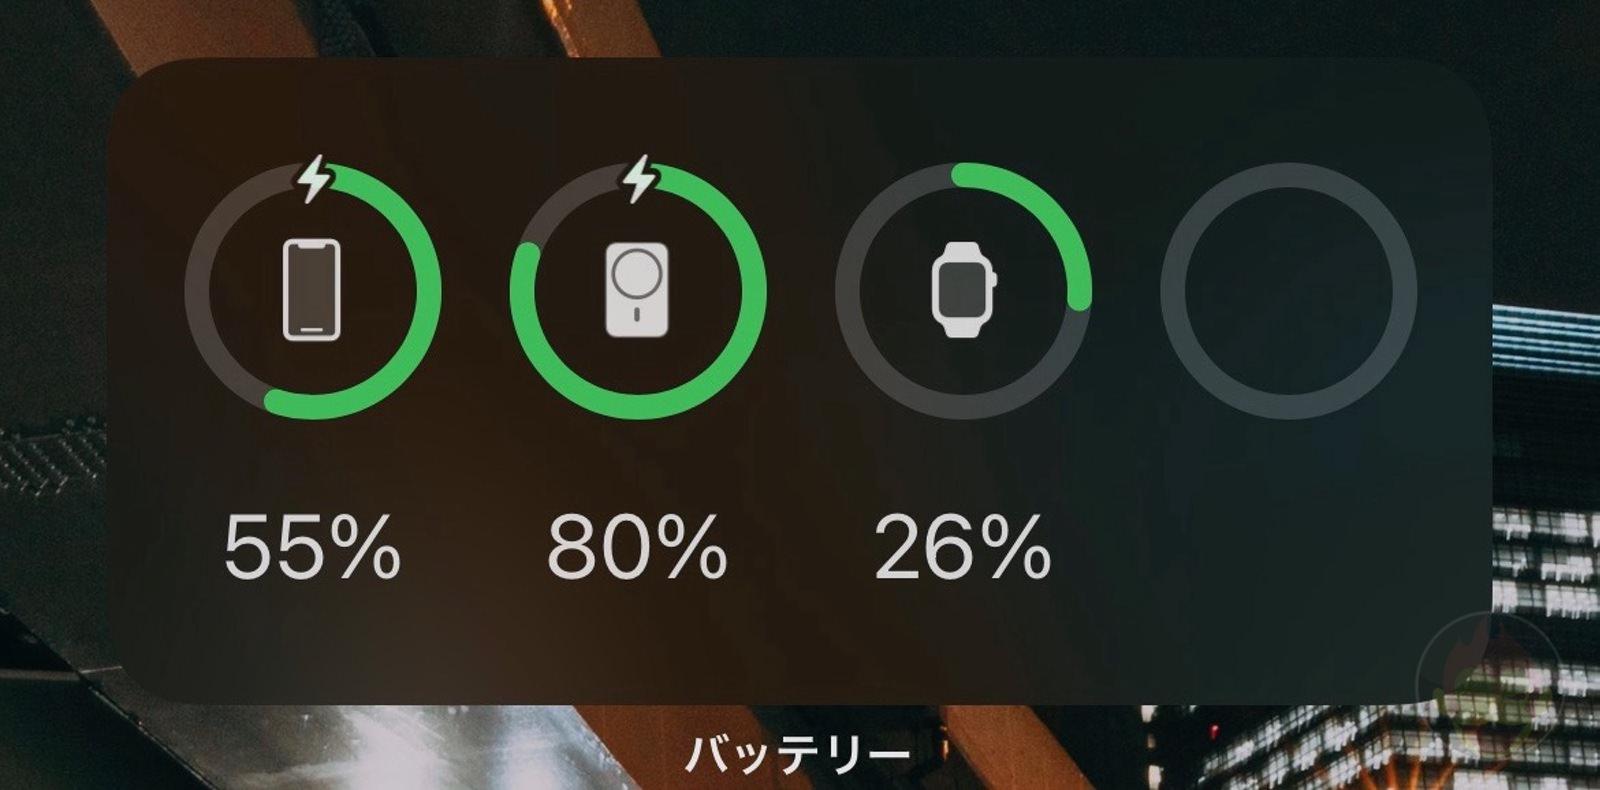 Charging the iphone through MagSafe 03